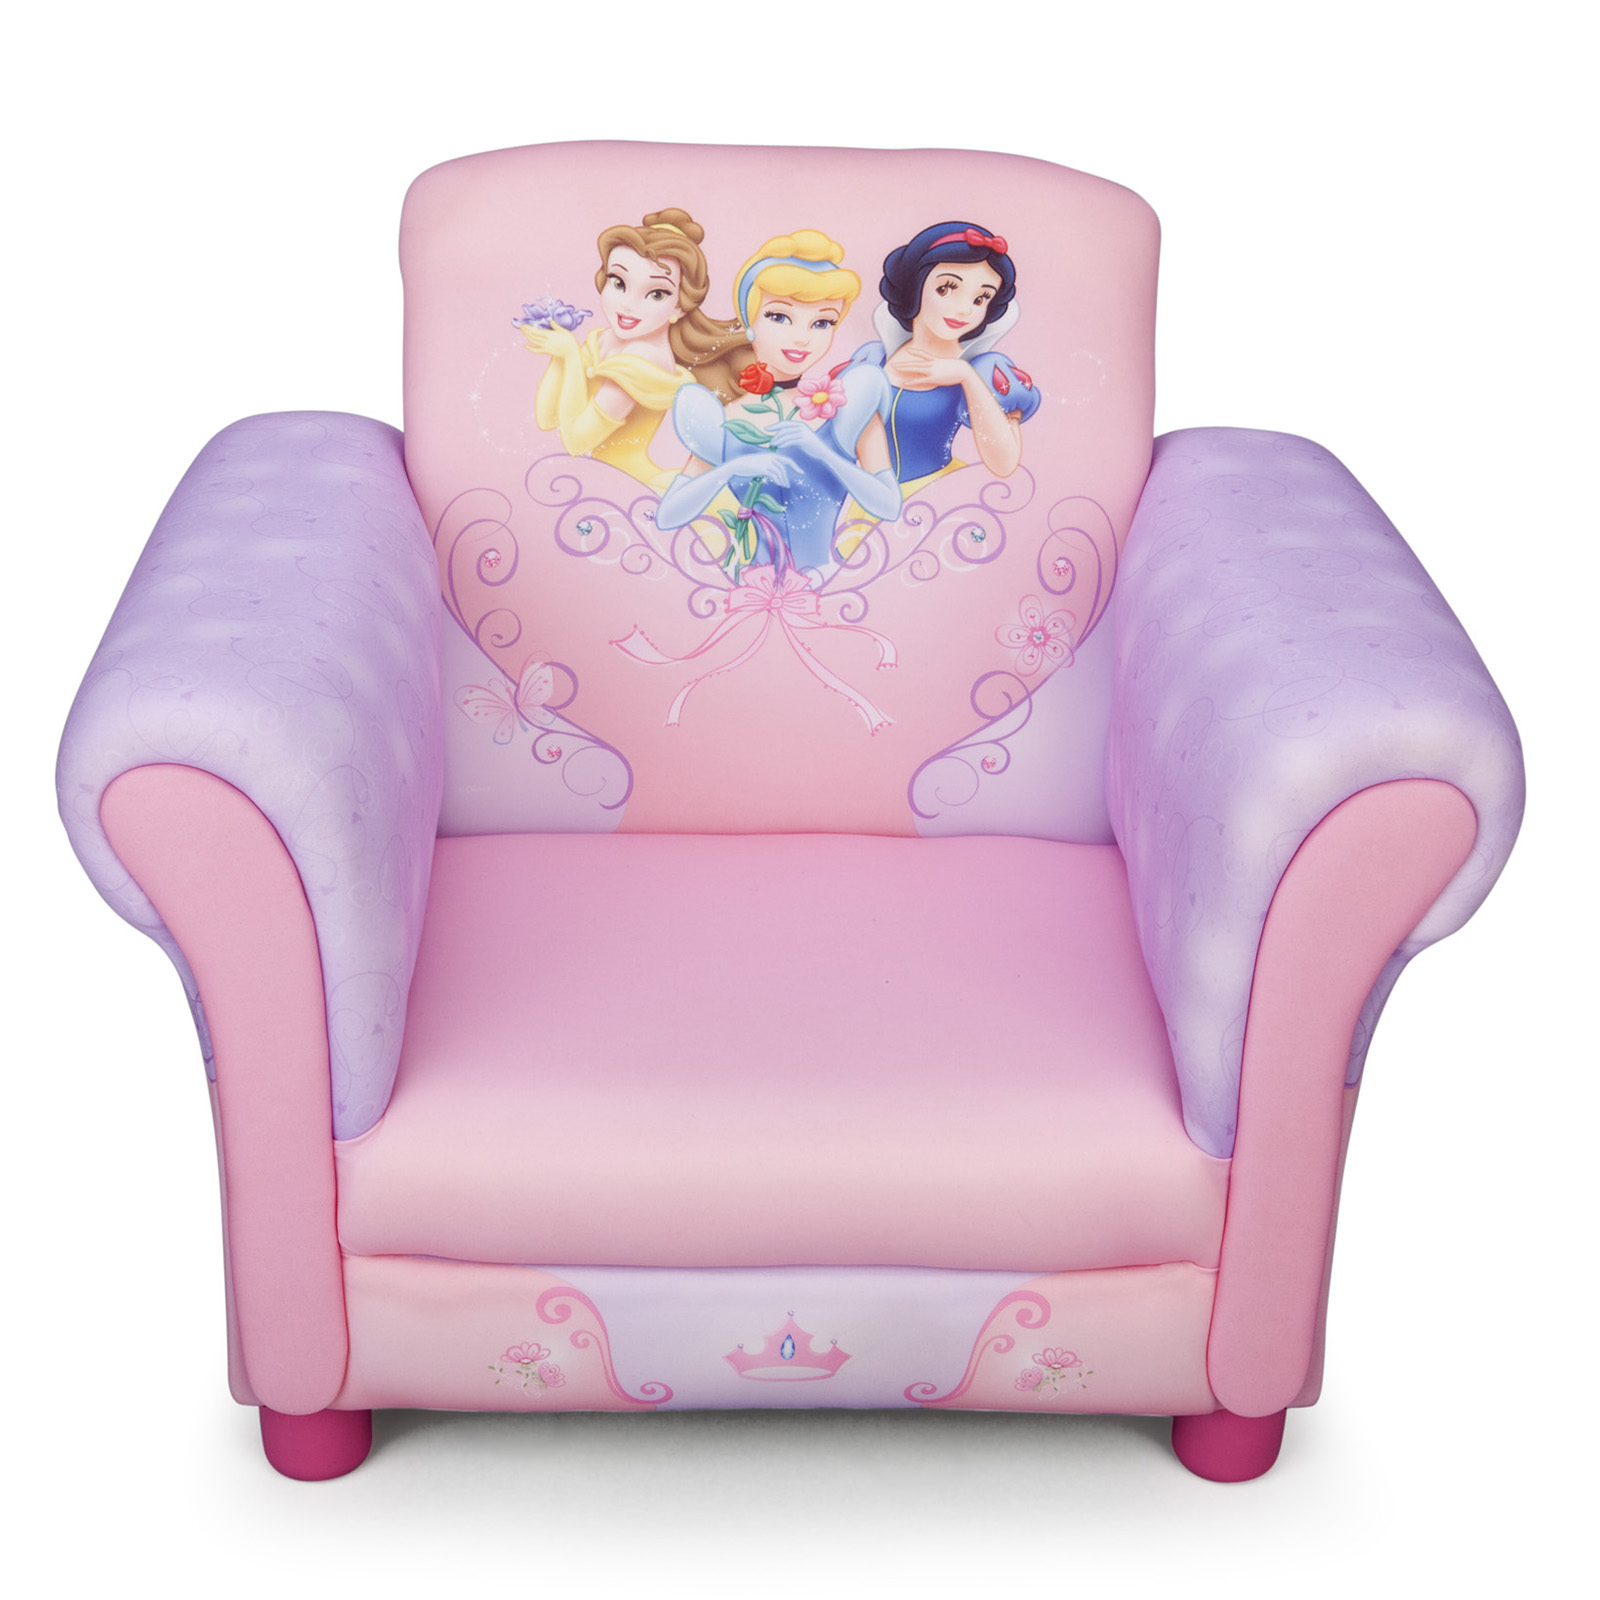 disney princess chair indoor rocking cushions sets new delta children upholstered pink